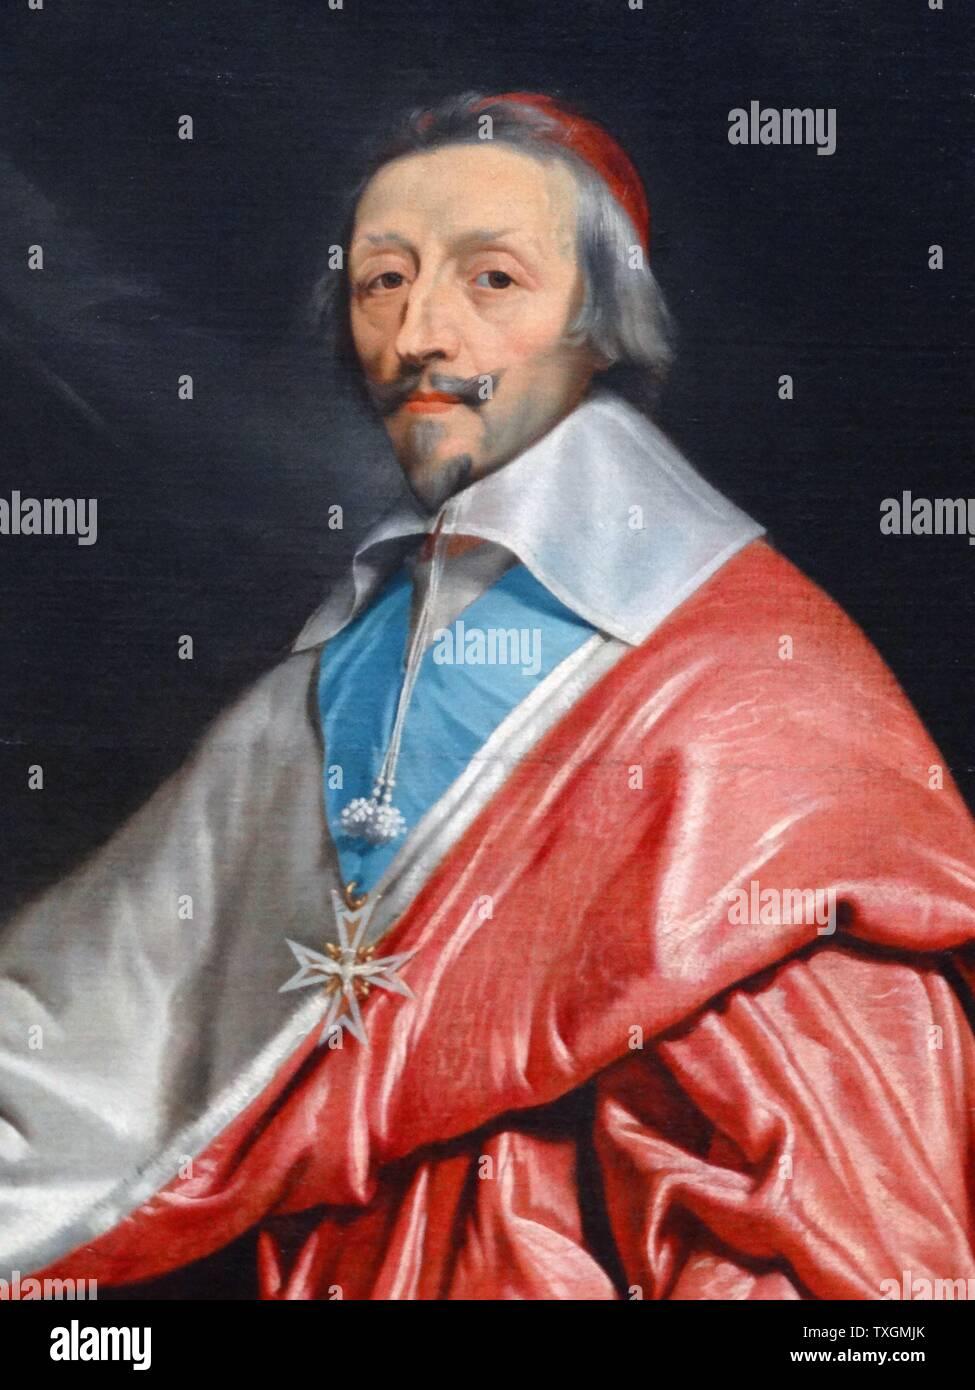 Cardinal Richelieu Imágenes De Stock Cardinal Richelieu